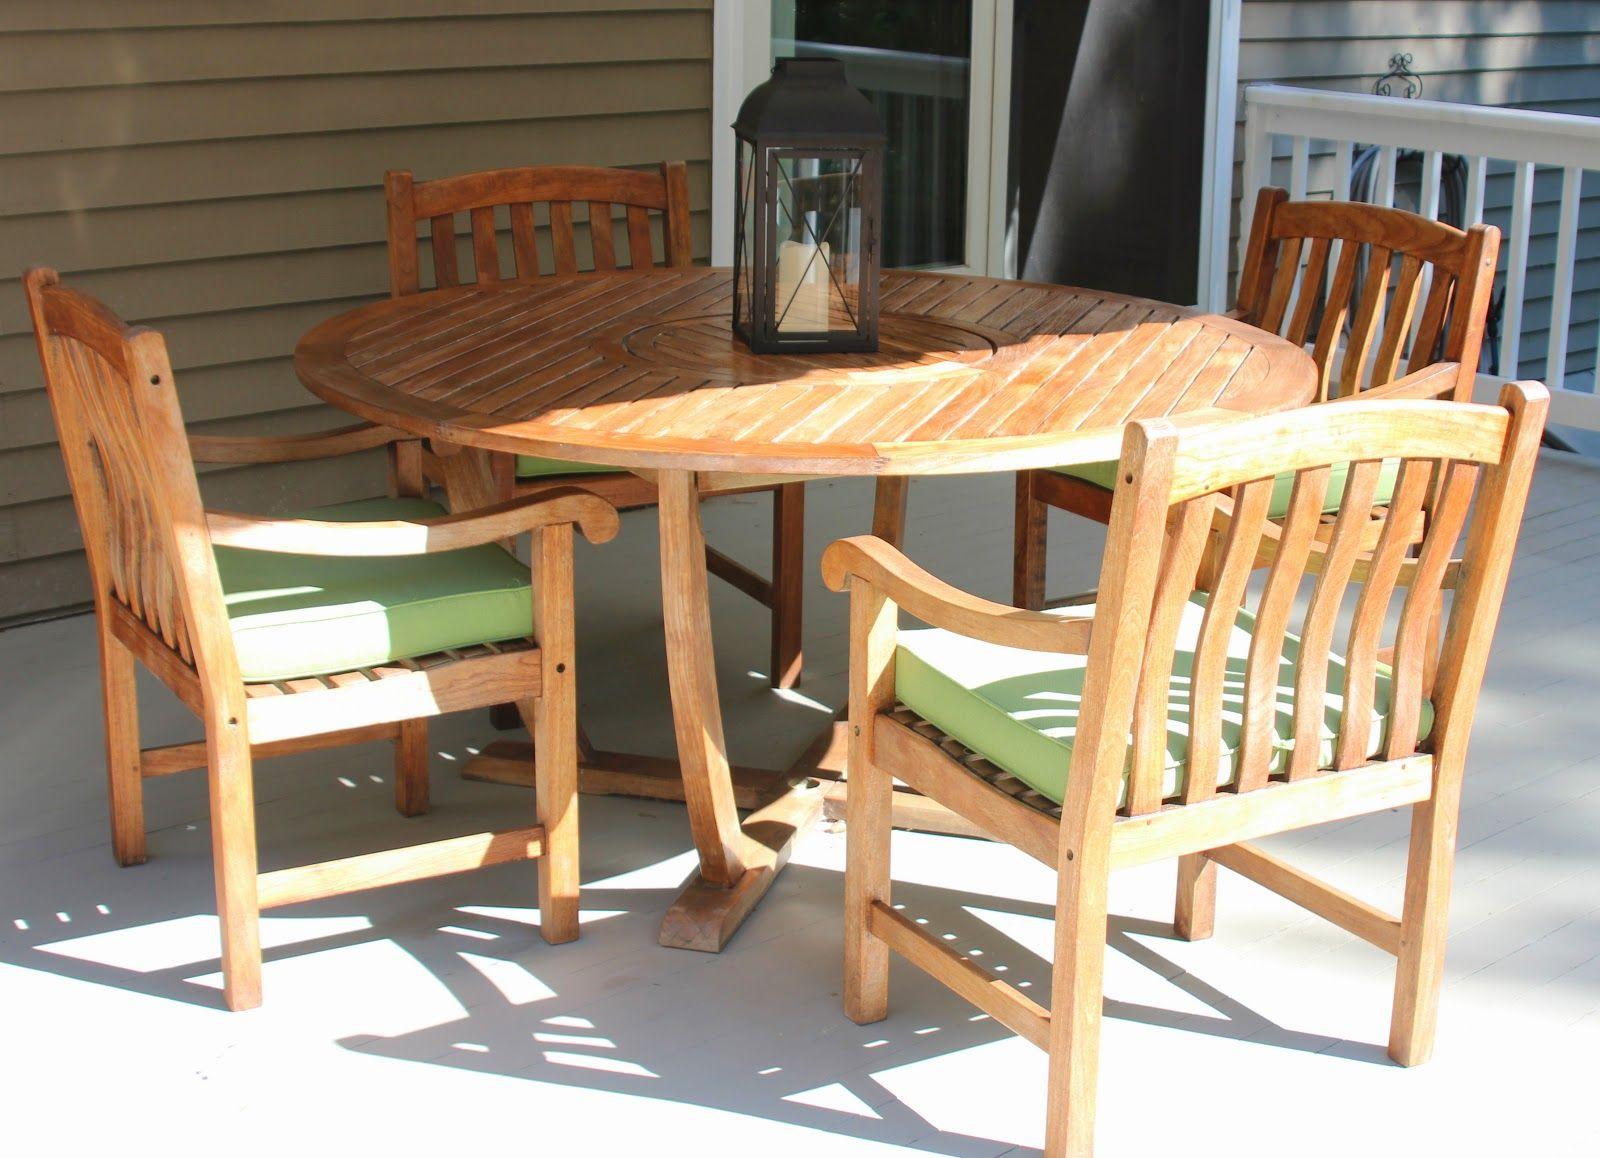 Cleaning Sealing Outdoor Teak Furniture Teak Outdoor Furniture